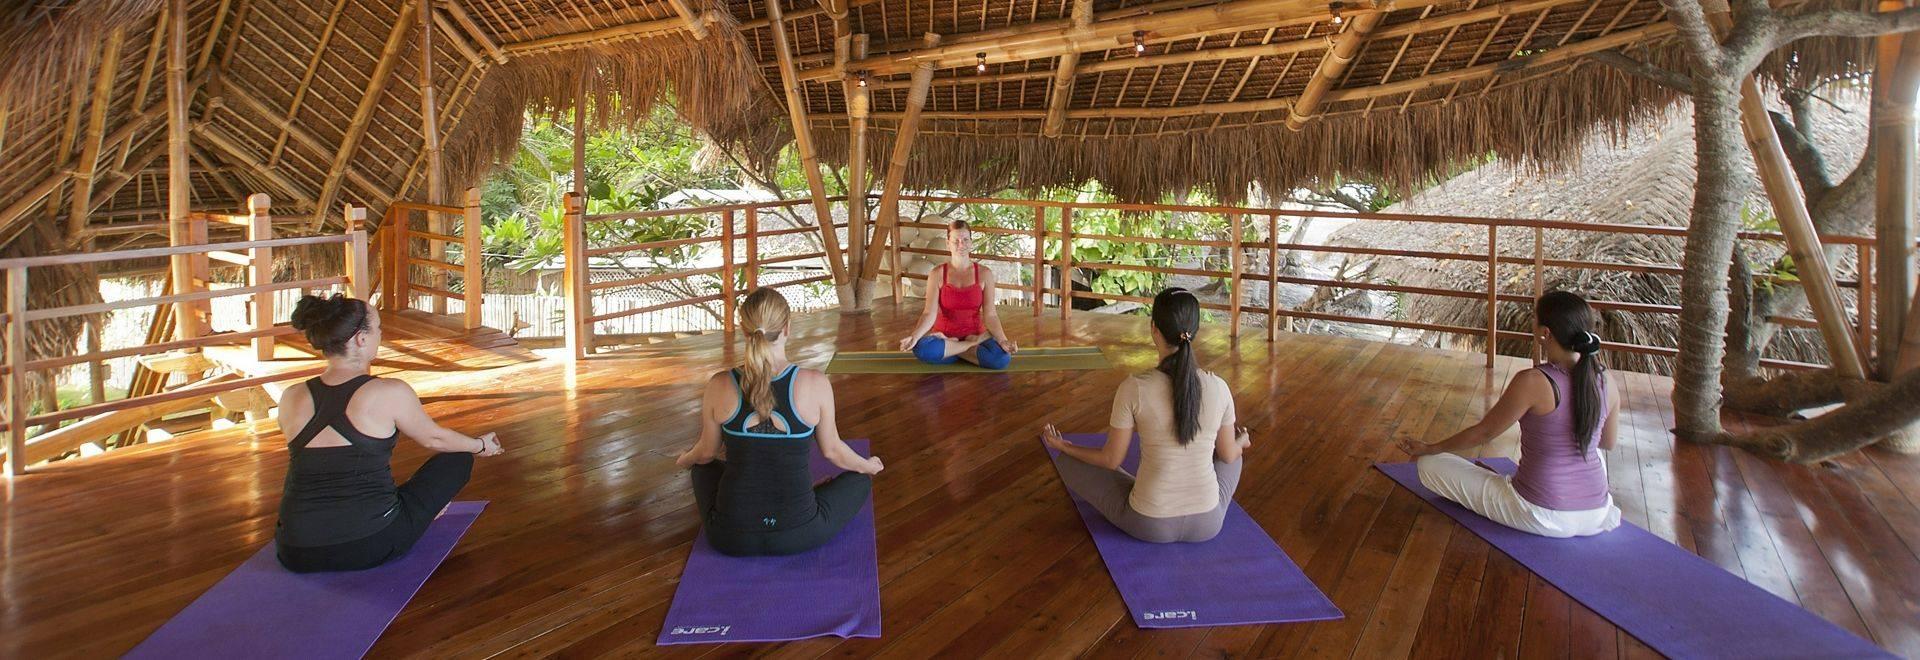 Atmosphere-Resort-yoga-class-treehouse.jpg